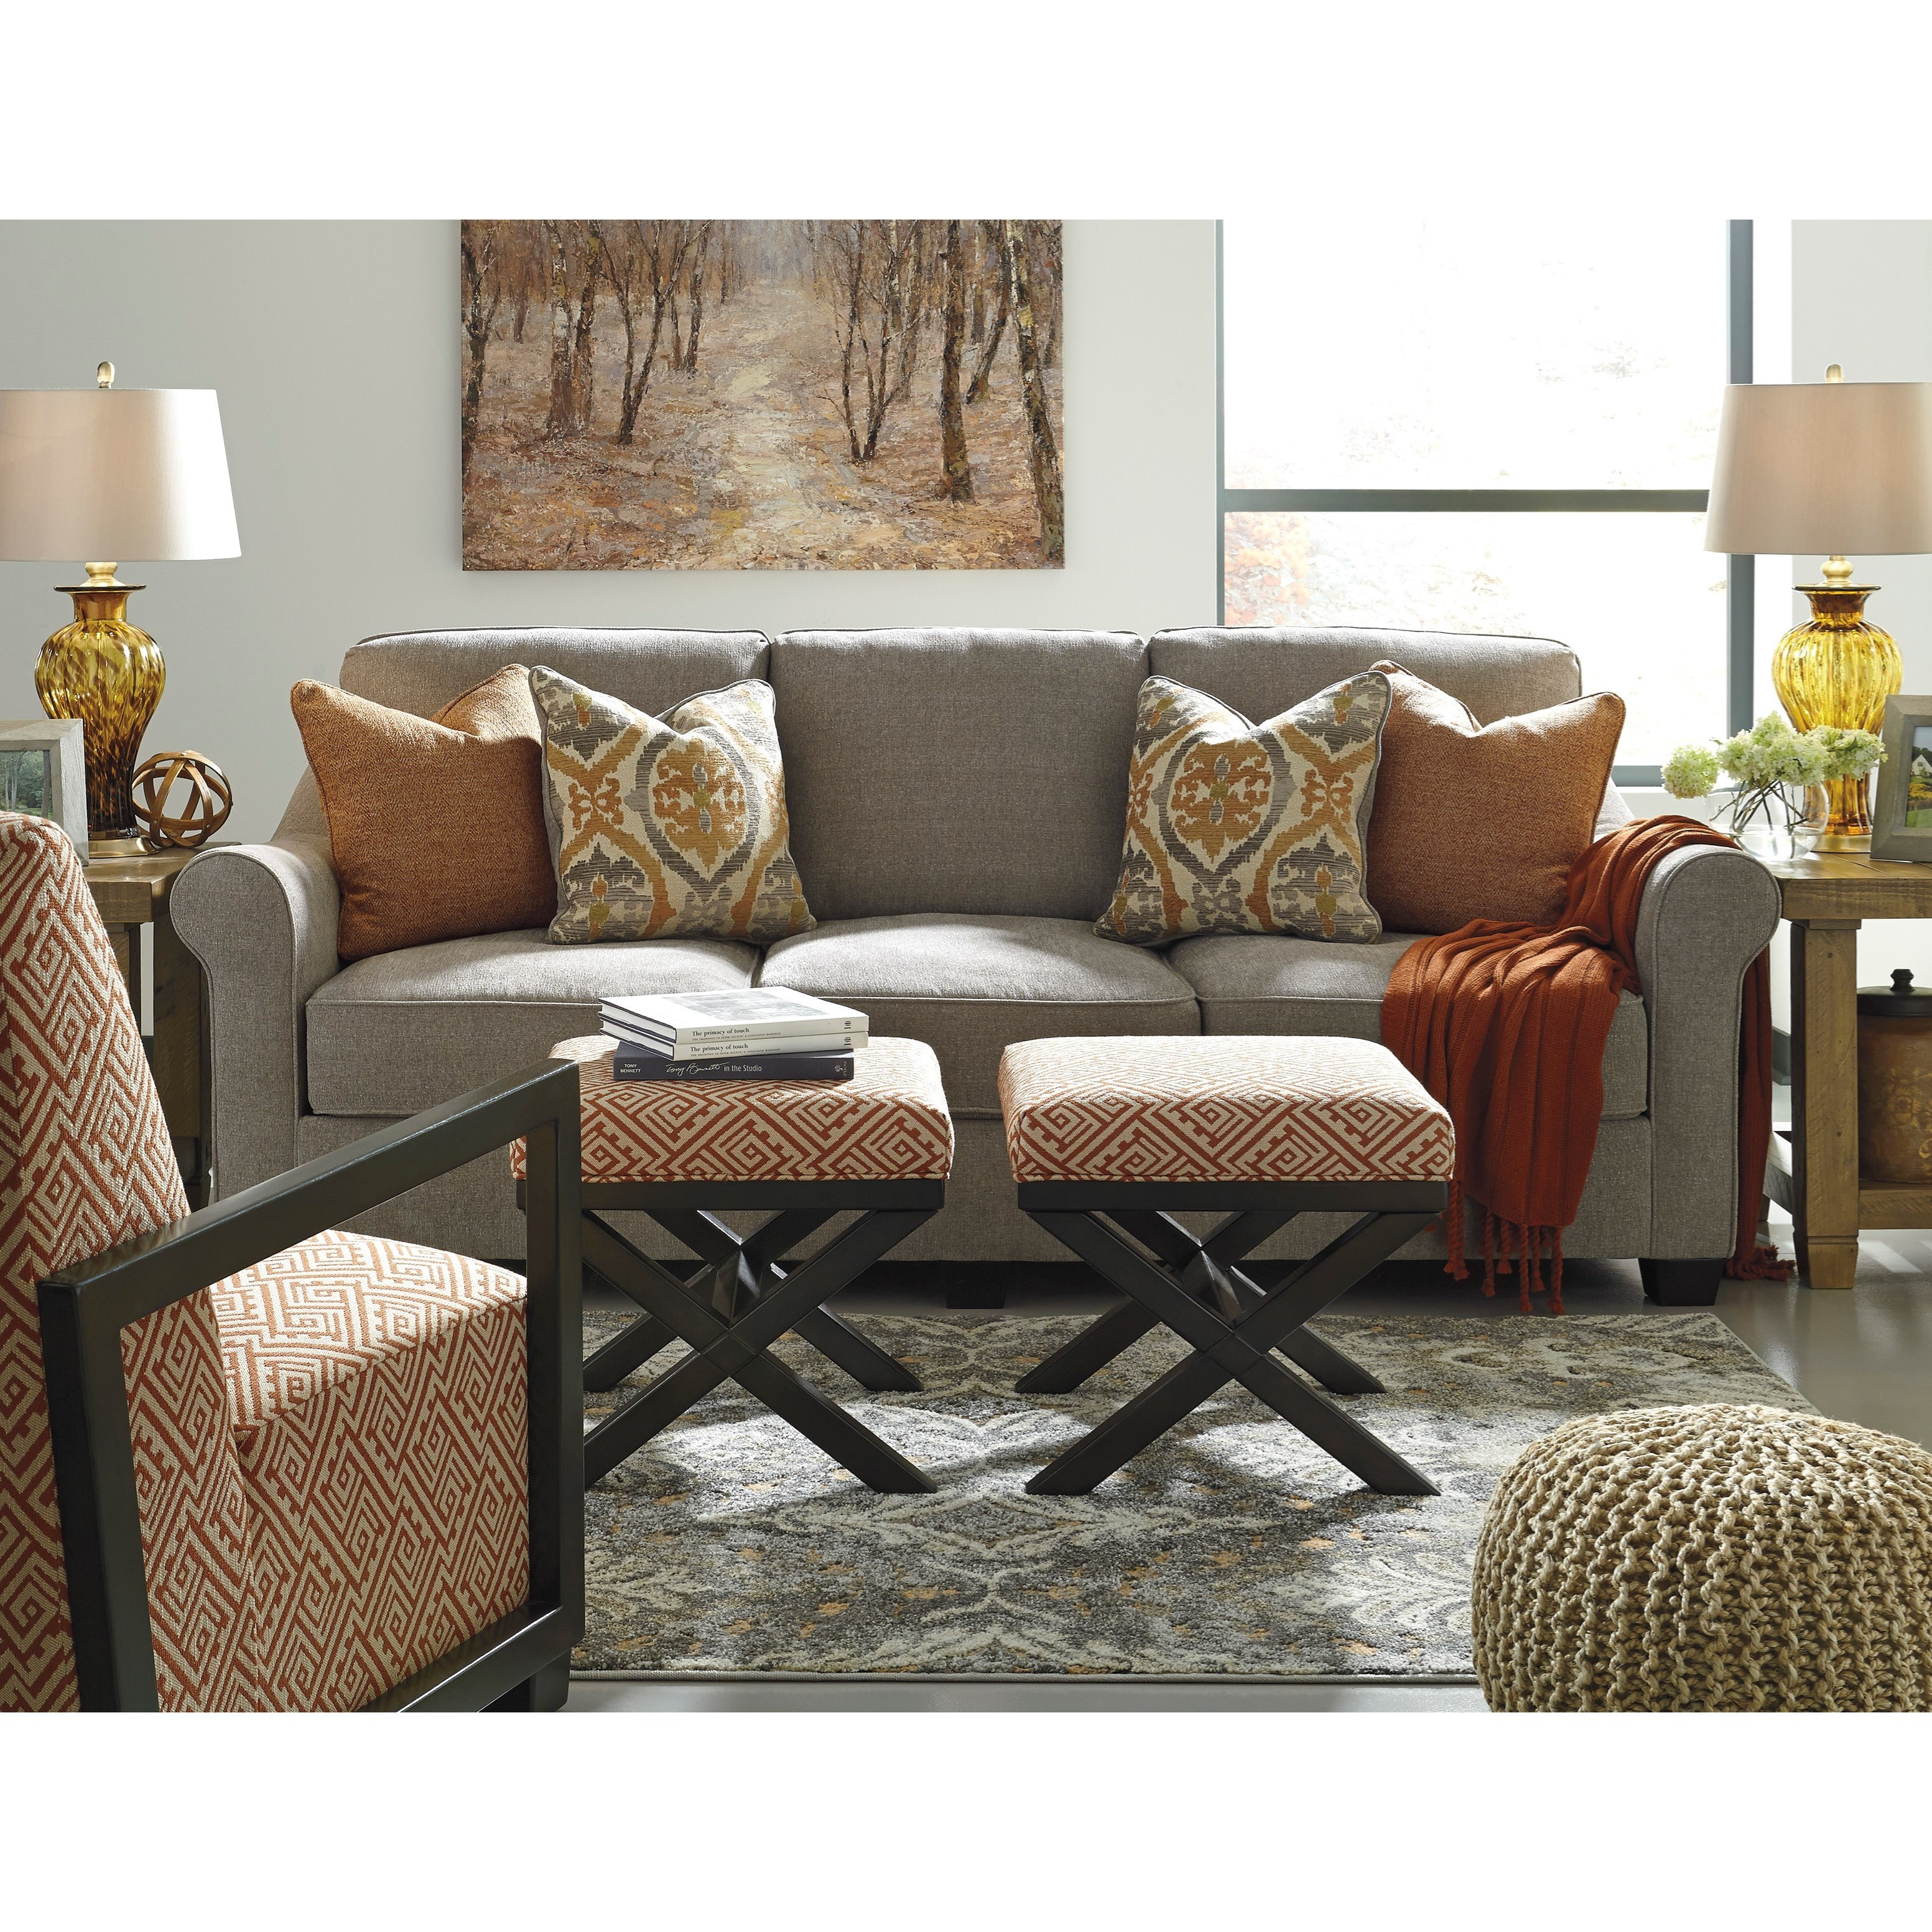 Benchcraft Leola Stationary Living Room Group - Item Number: 53601 Living Room Group 2